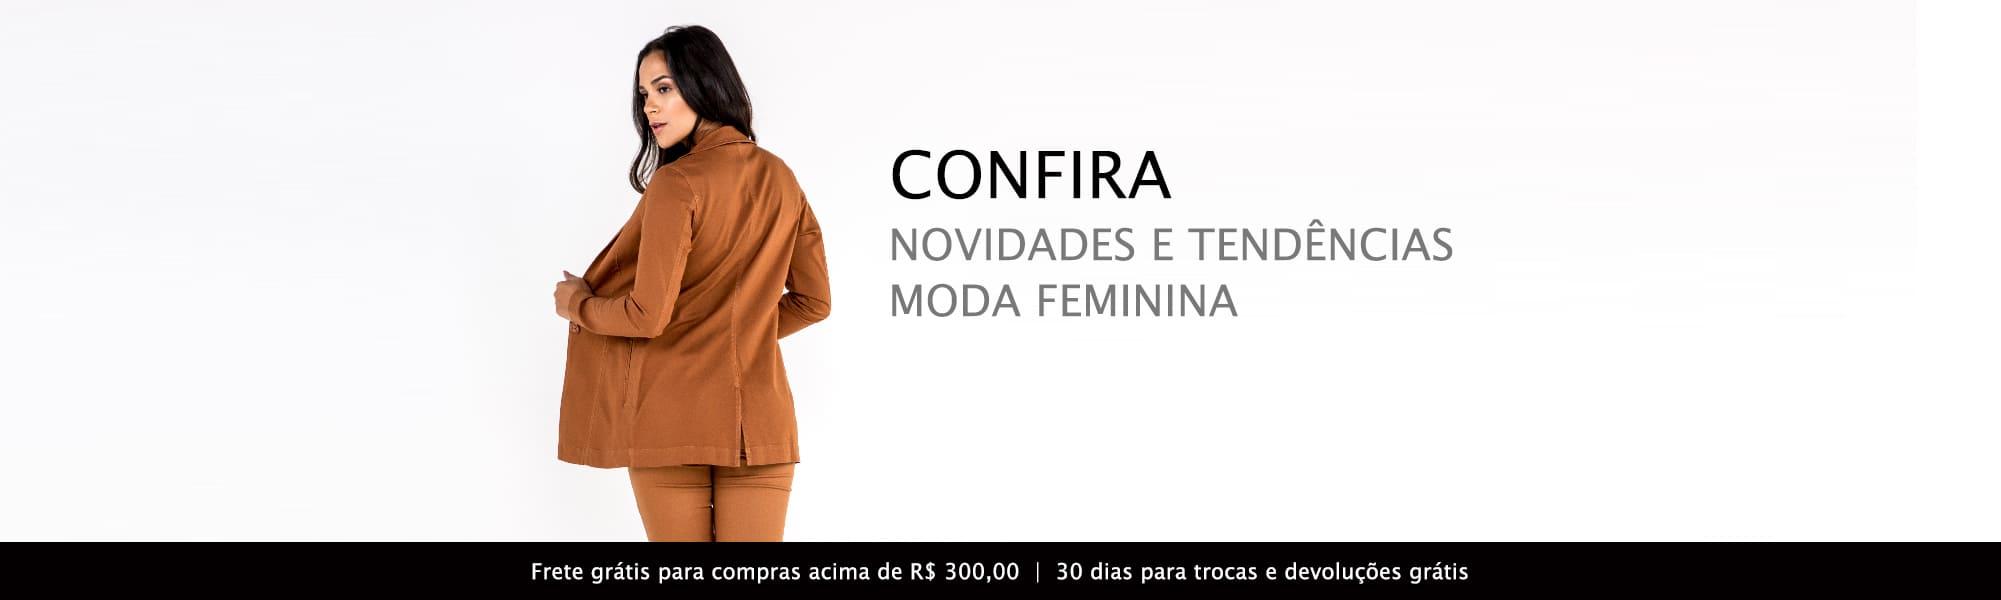 Confira Tendências da Moda Feminina!